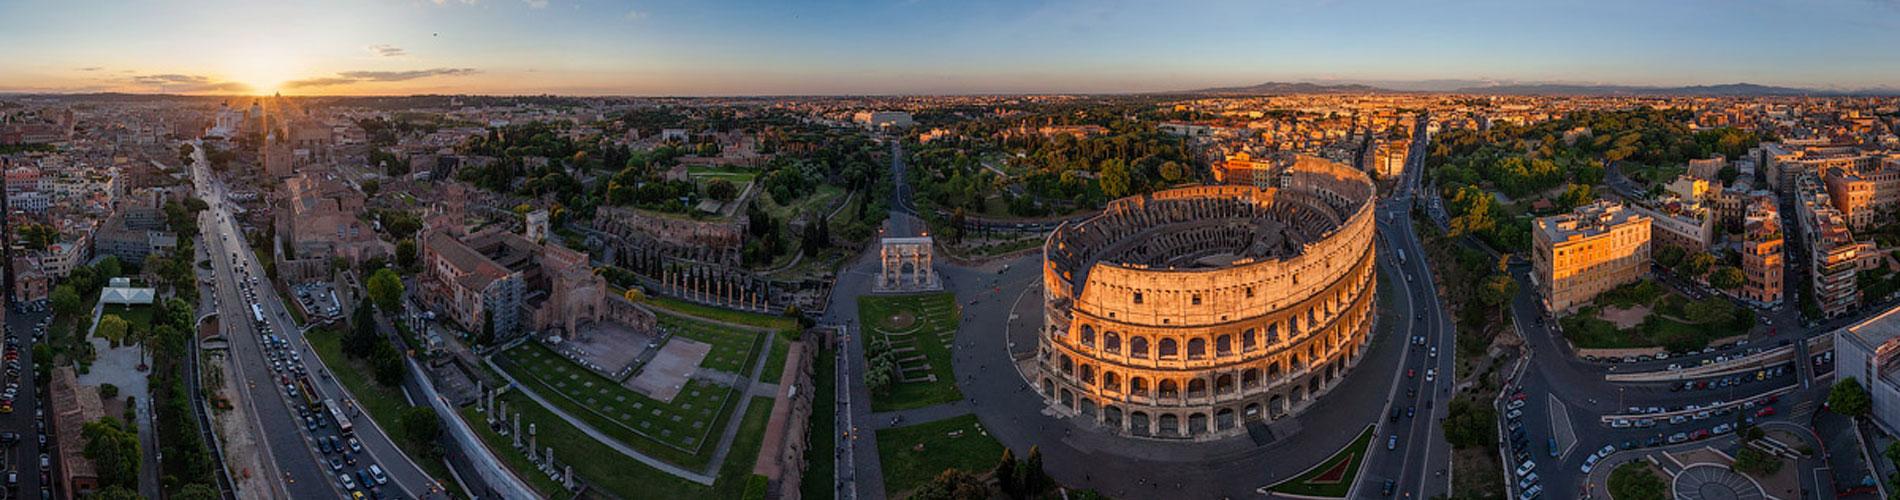 B&B Roma Colosseo